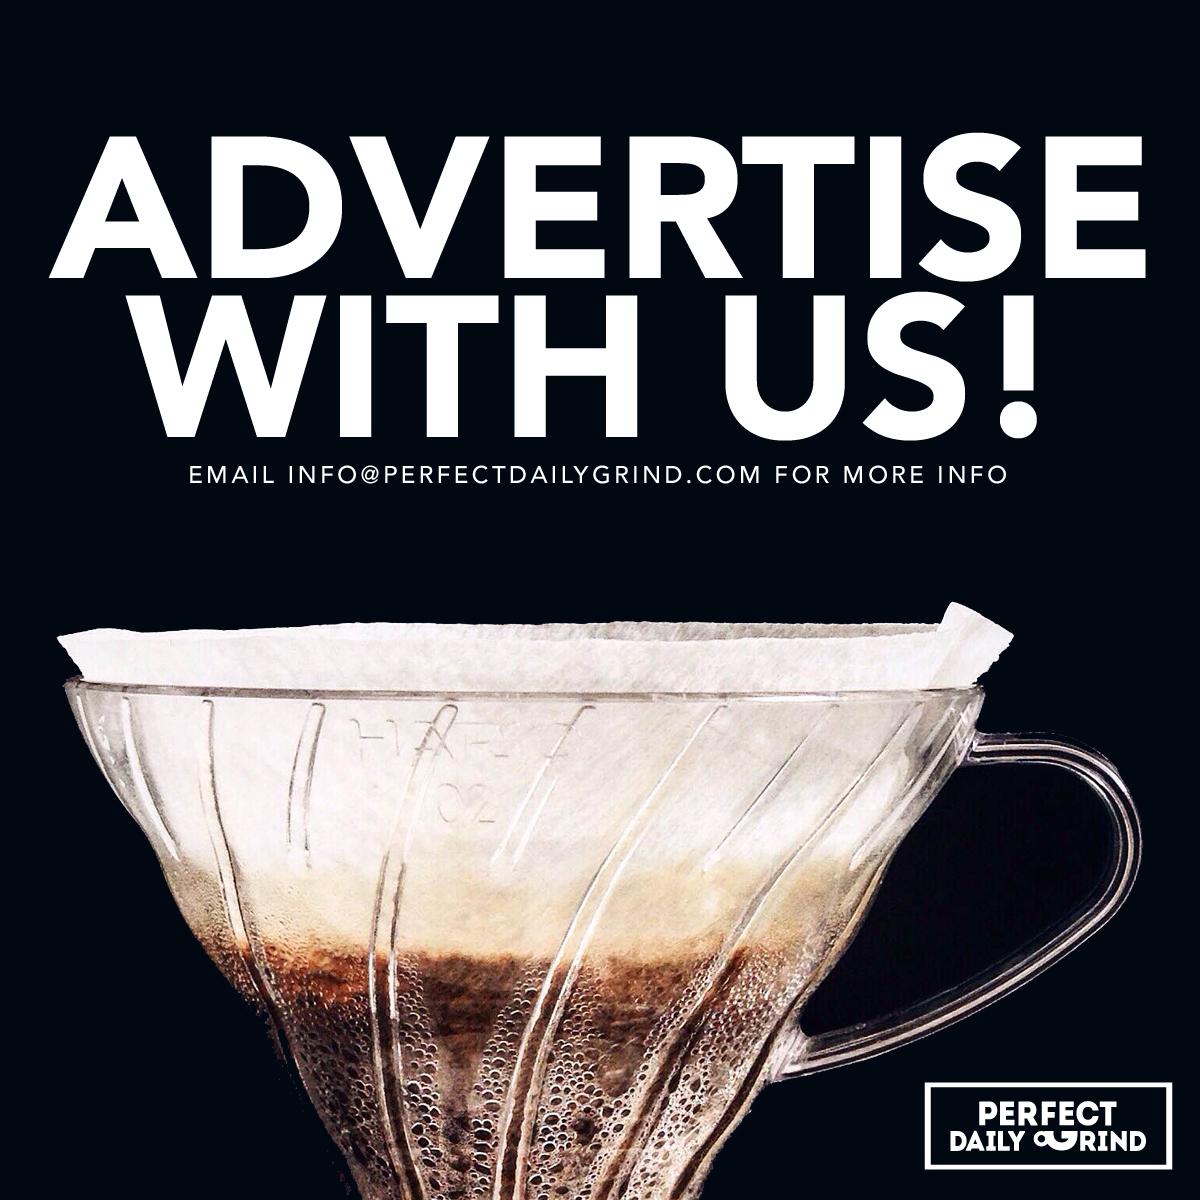 AdvertiseWithUs-V5.jpg